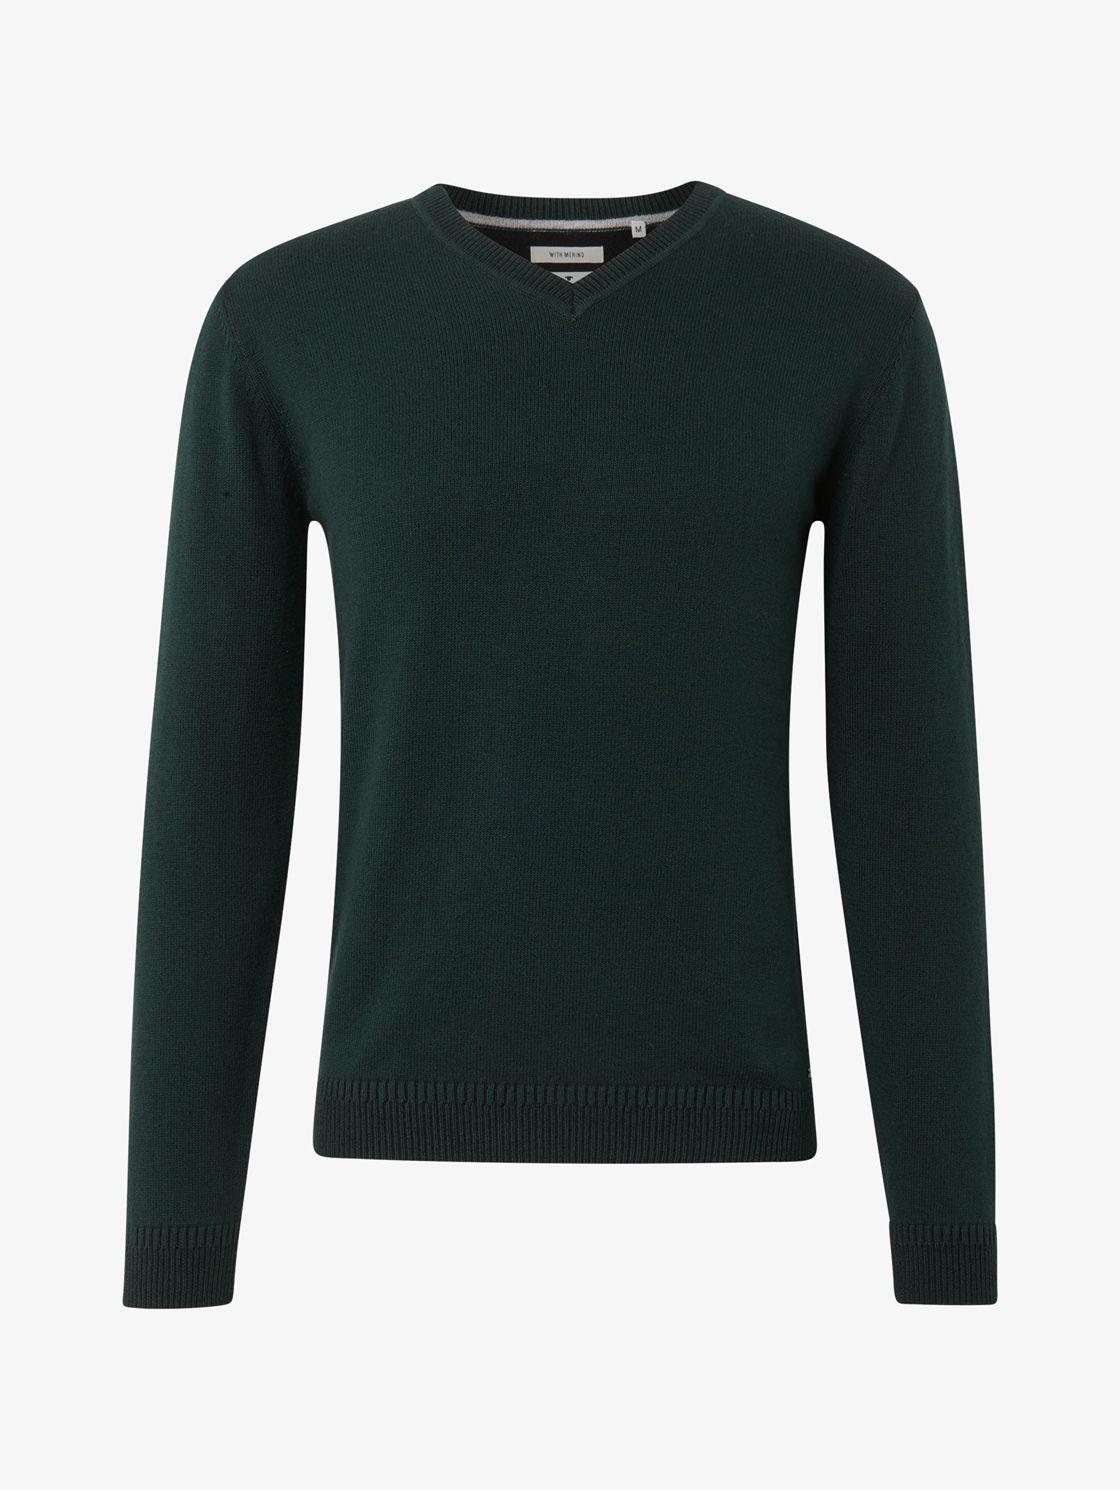 Пуловер от Tom Tailor